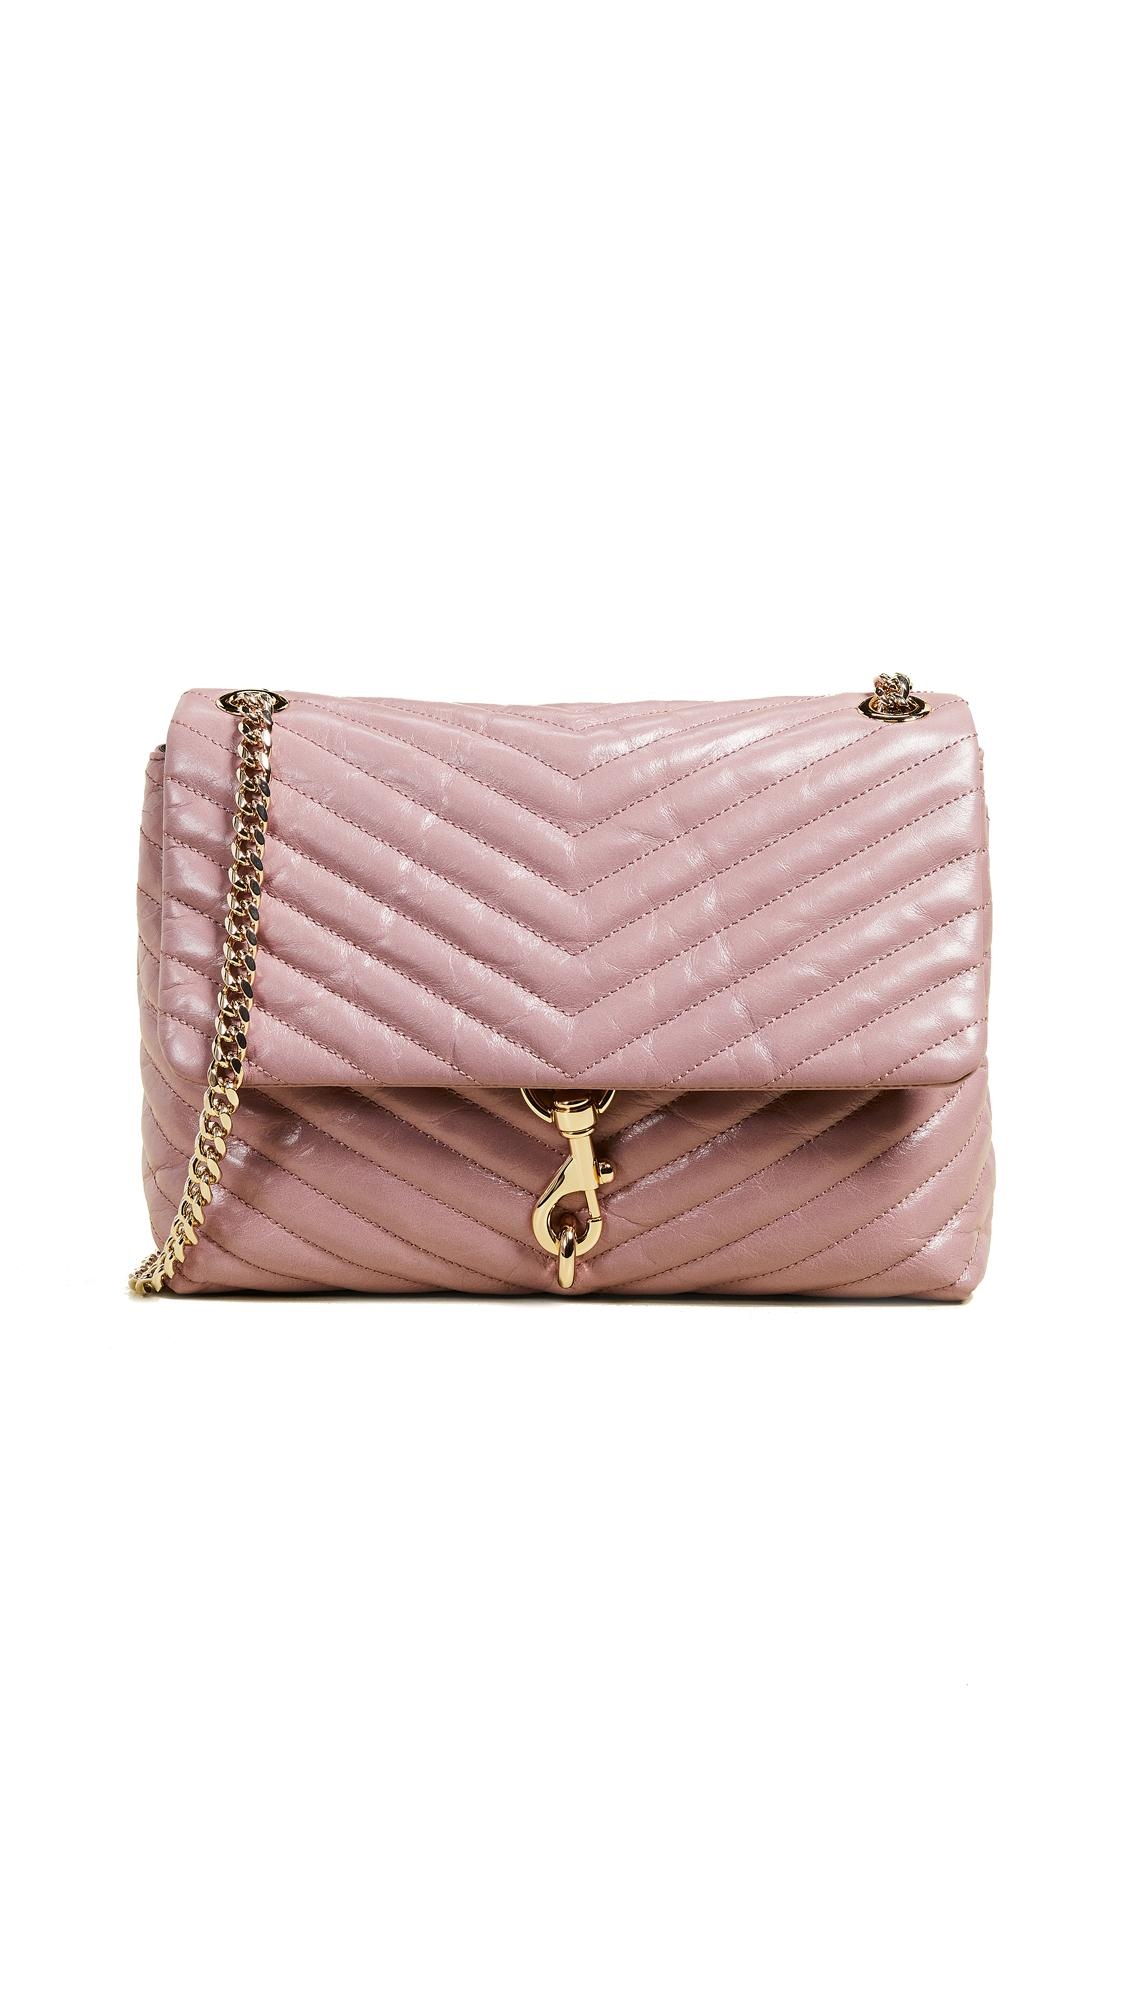 a0539f5dff29 Rebecca Minkoff Edie Quilted Shoulder Bag In Mink